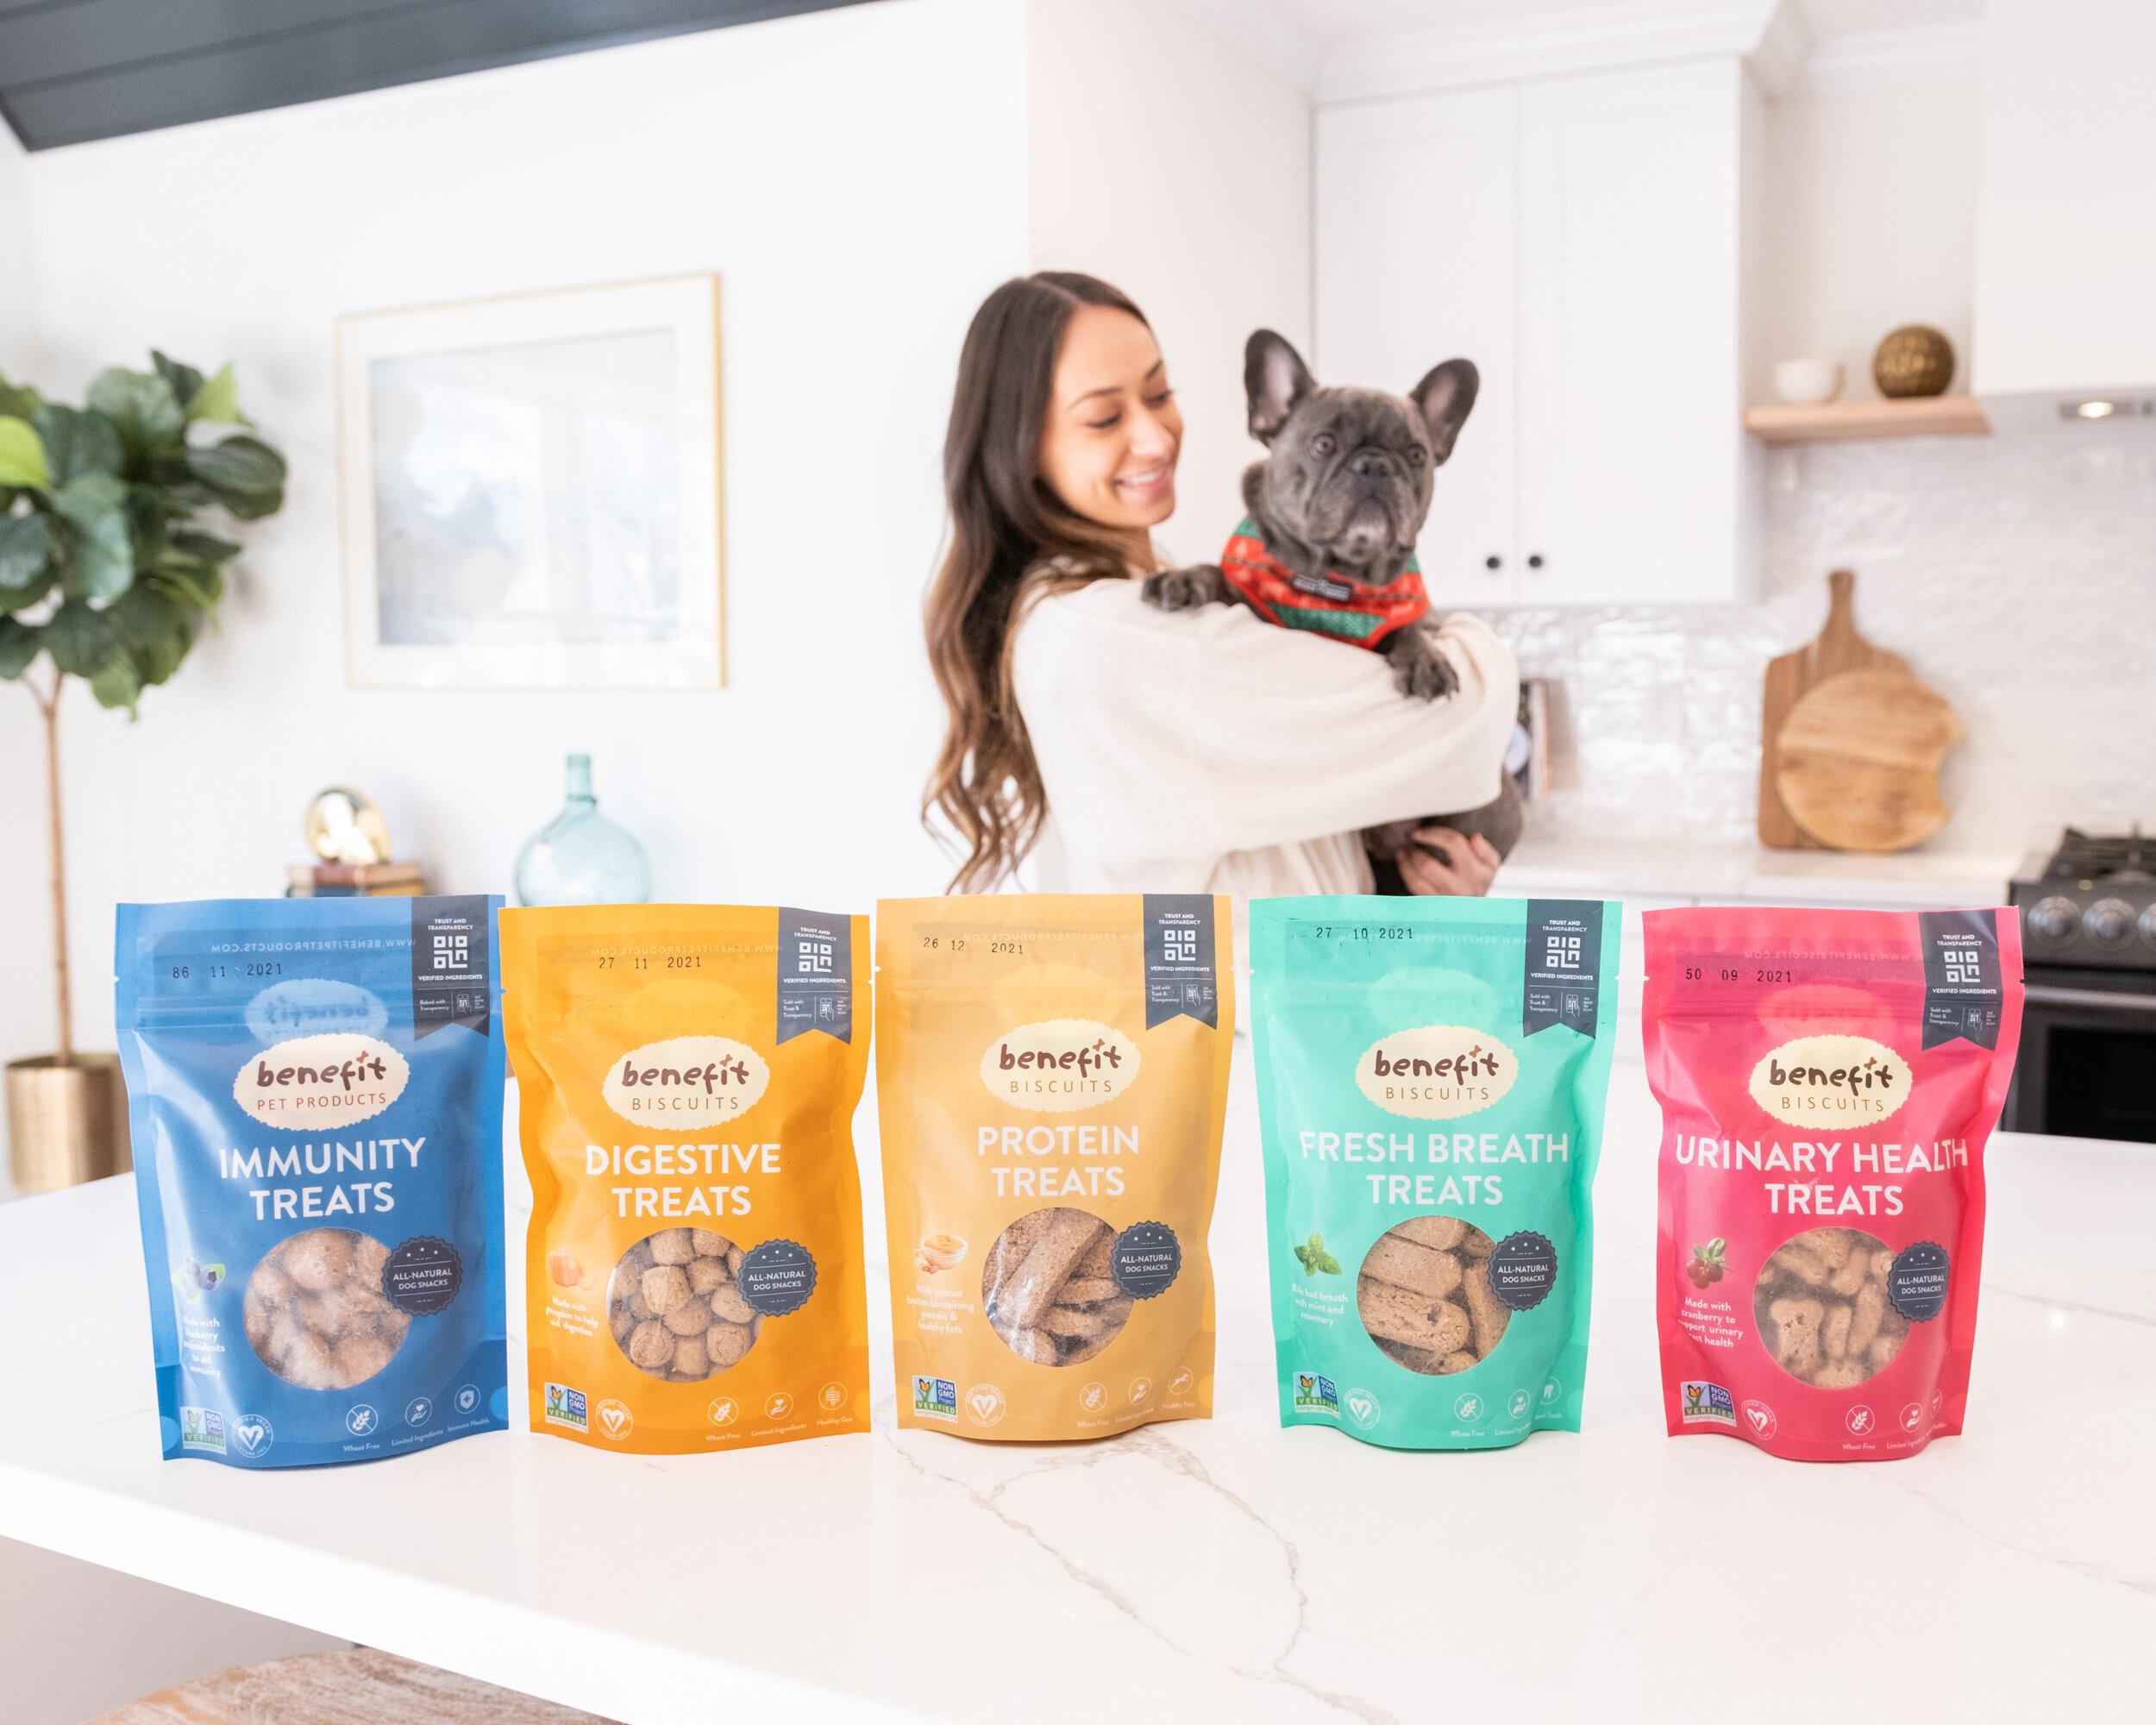 Benefit Pet Products